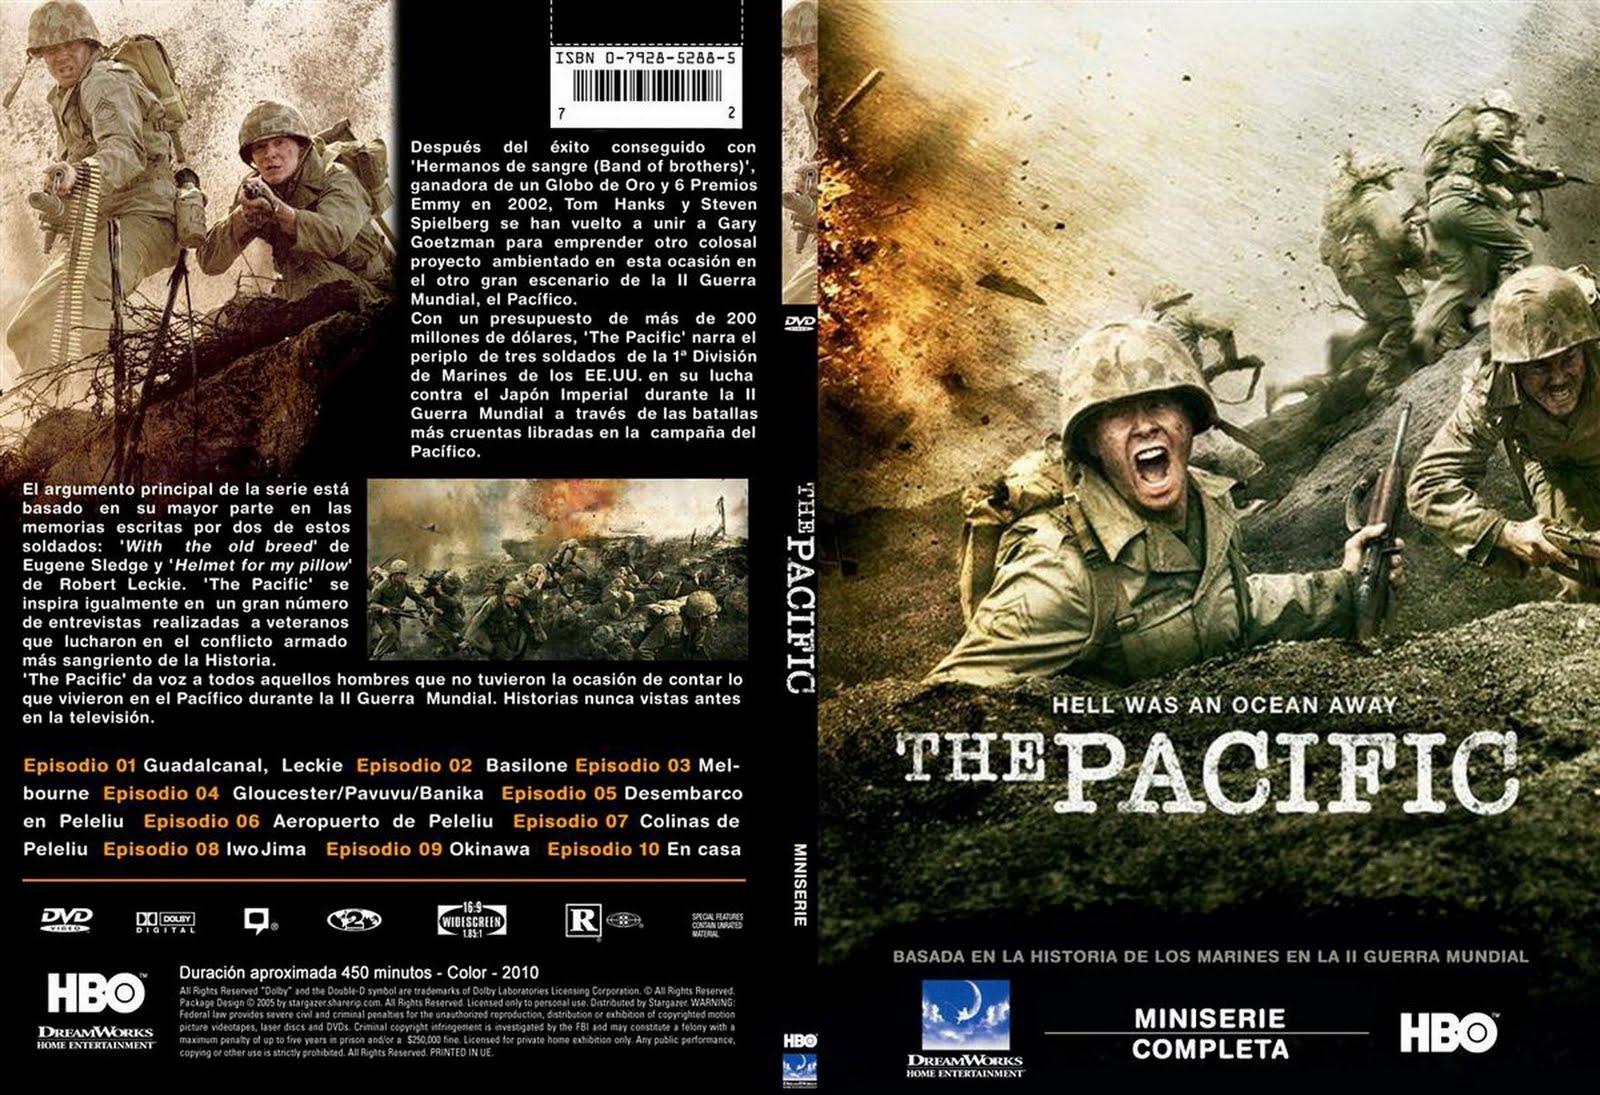 http://3.bp.blogspot.com/_mGkxudAo5eA/TMogxrO4fUI/AAAAAAAADNg/cj4Upj-PeH4/s1600/the_pacific-tapa.jpg